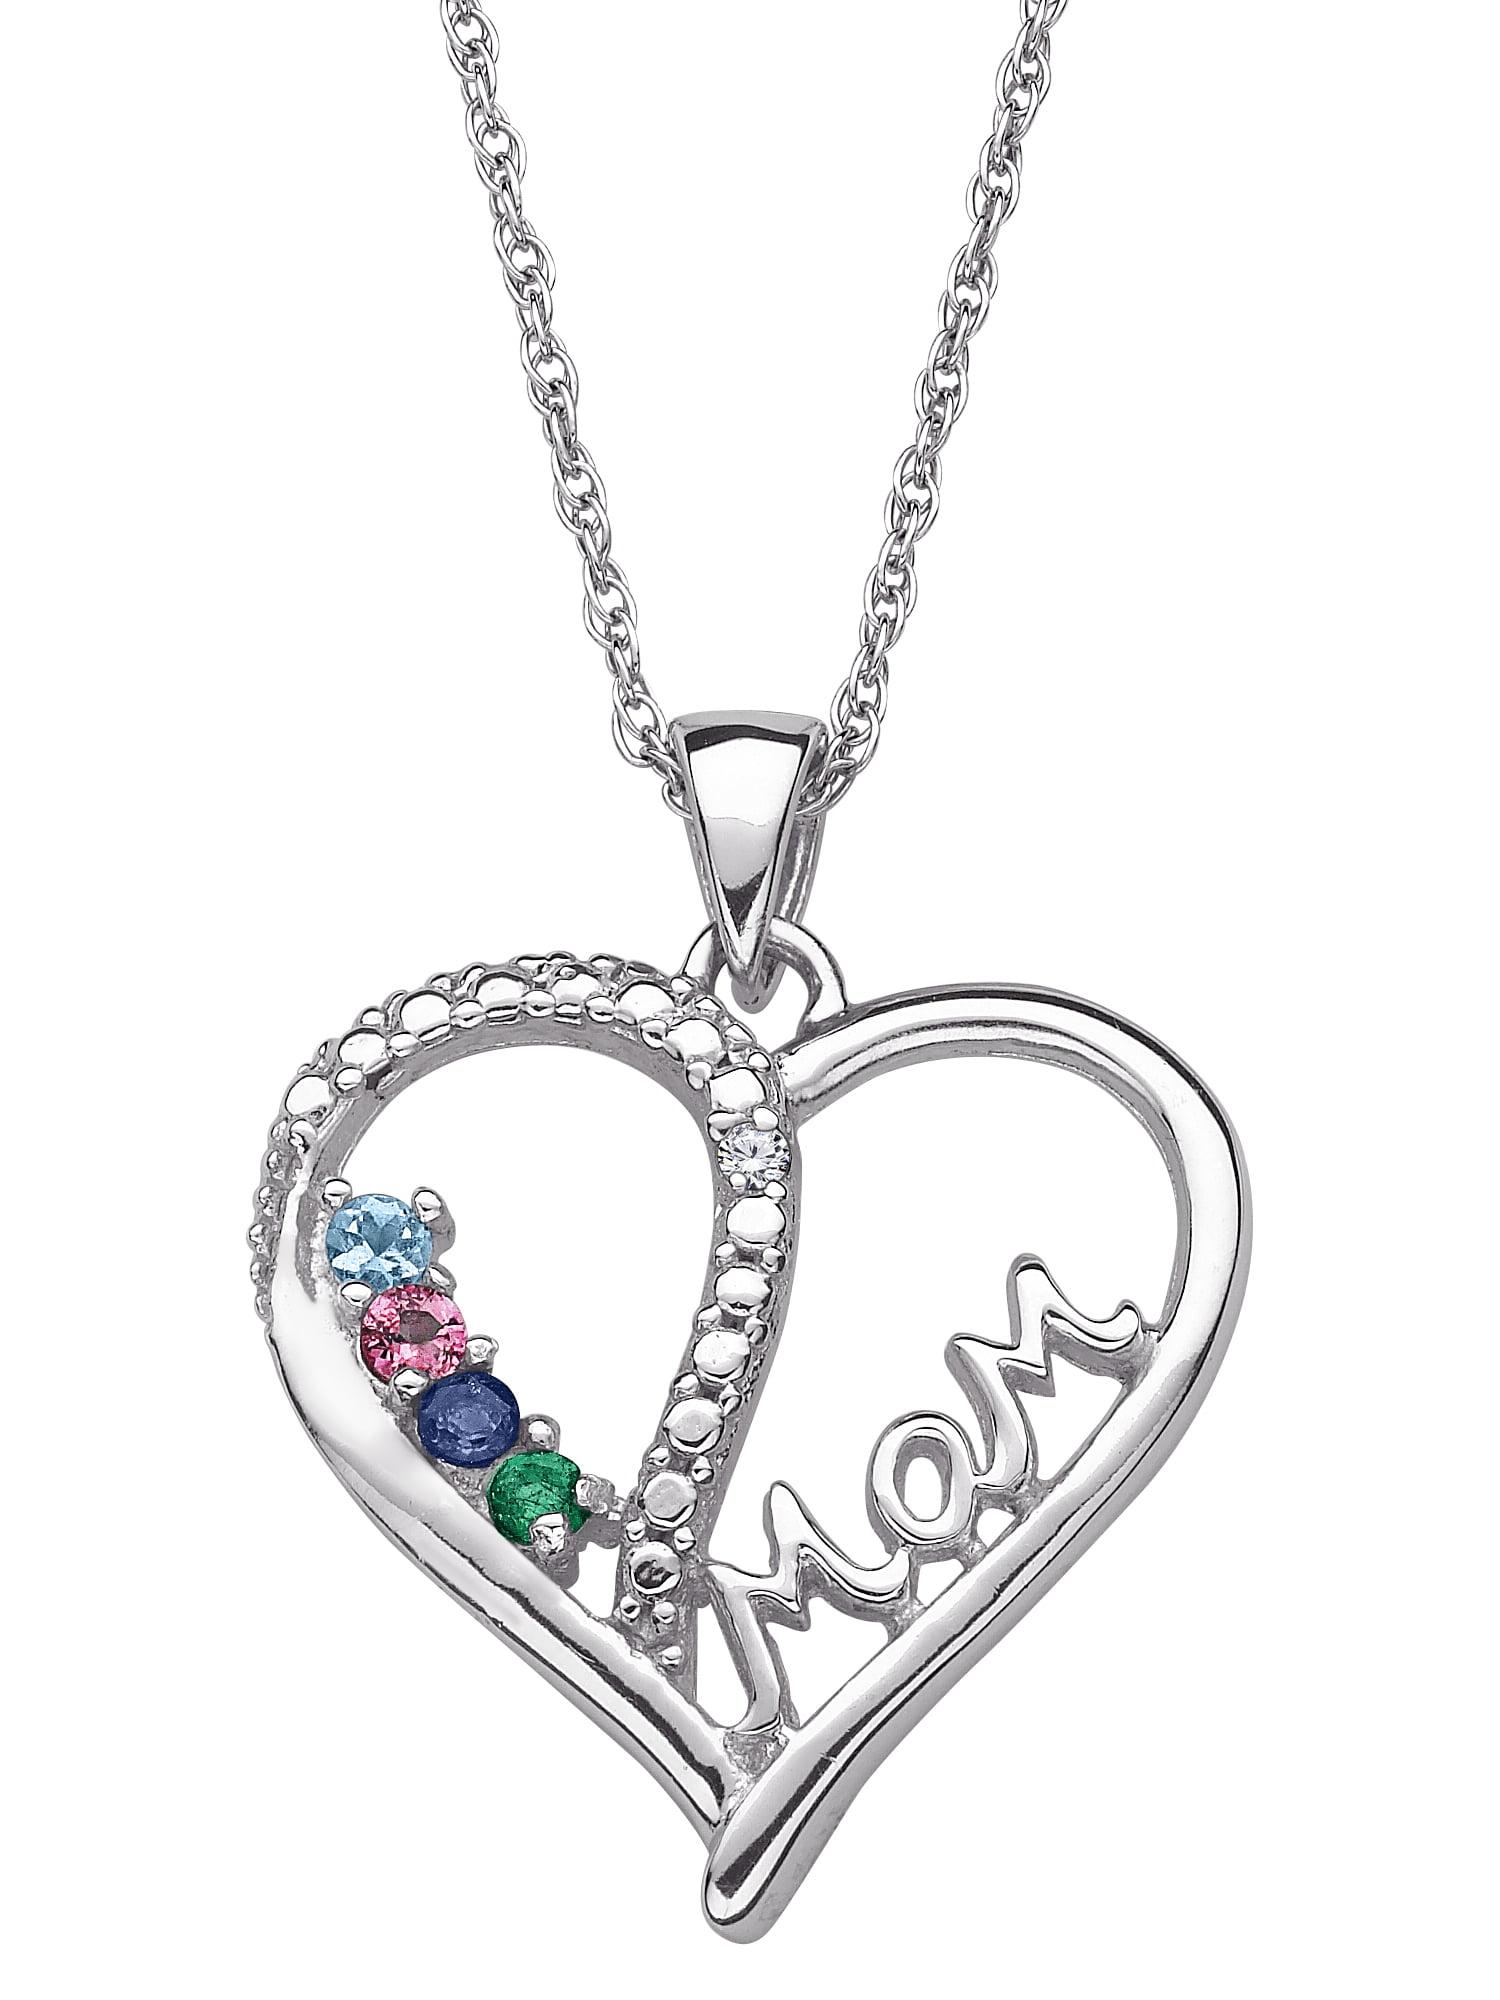 Personalized Planet Jewelry - Family Jewelry Personalized ...